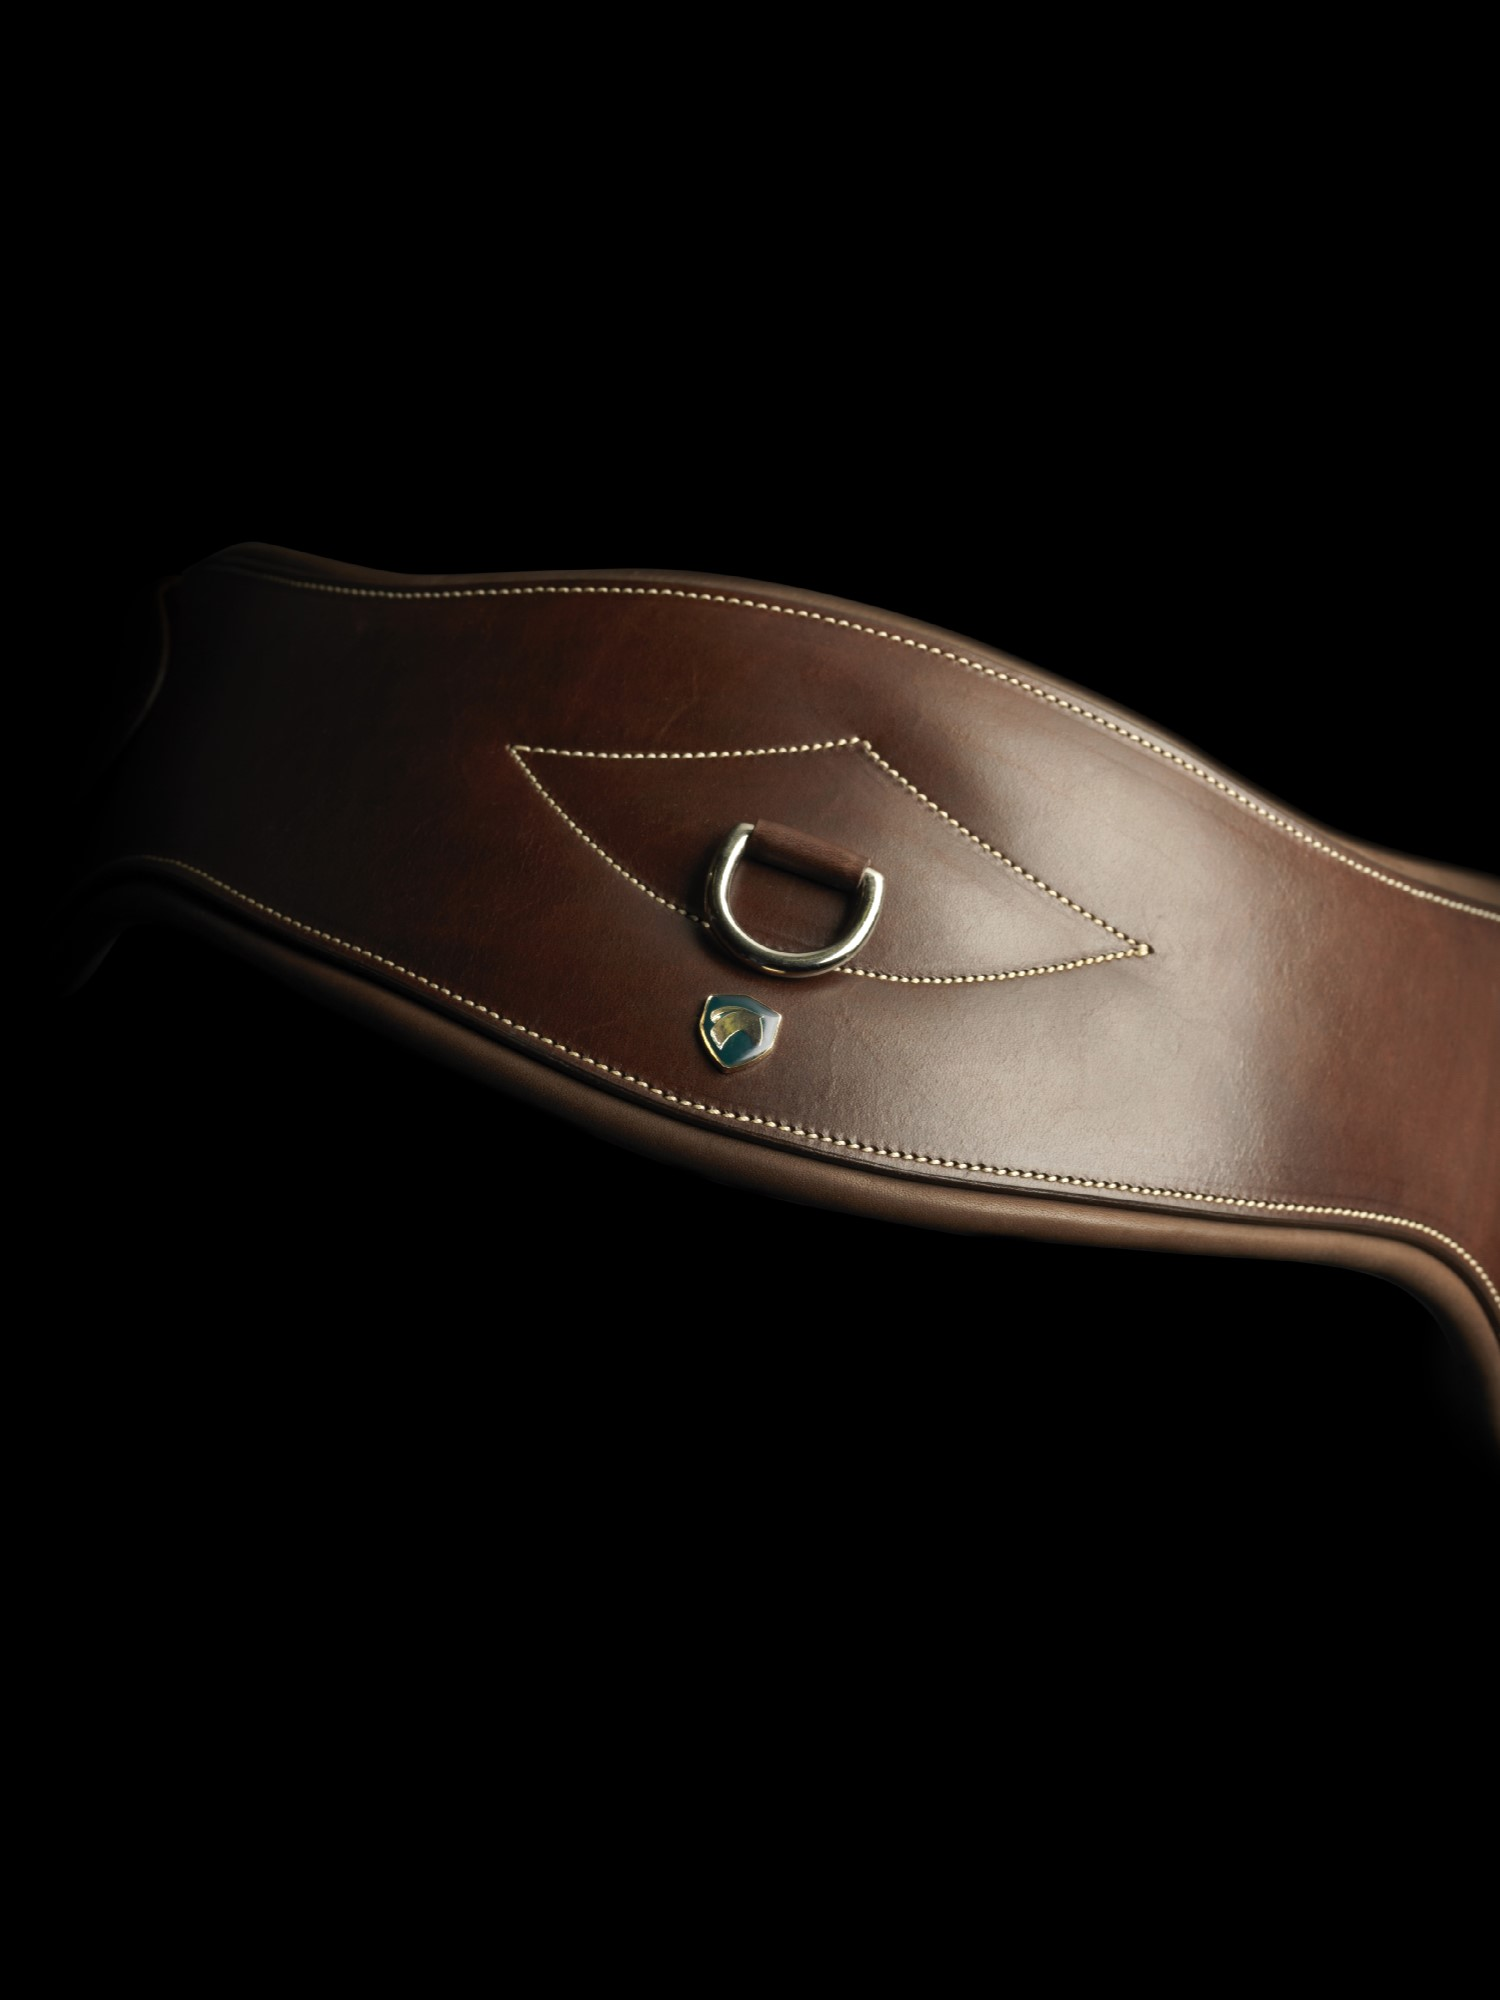 Graziozo Pesaro Dressage girth brown